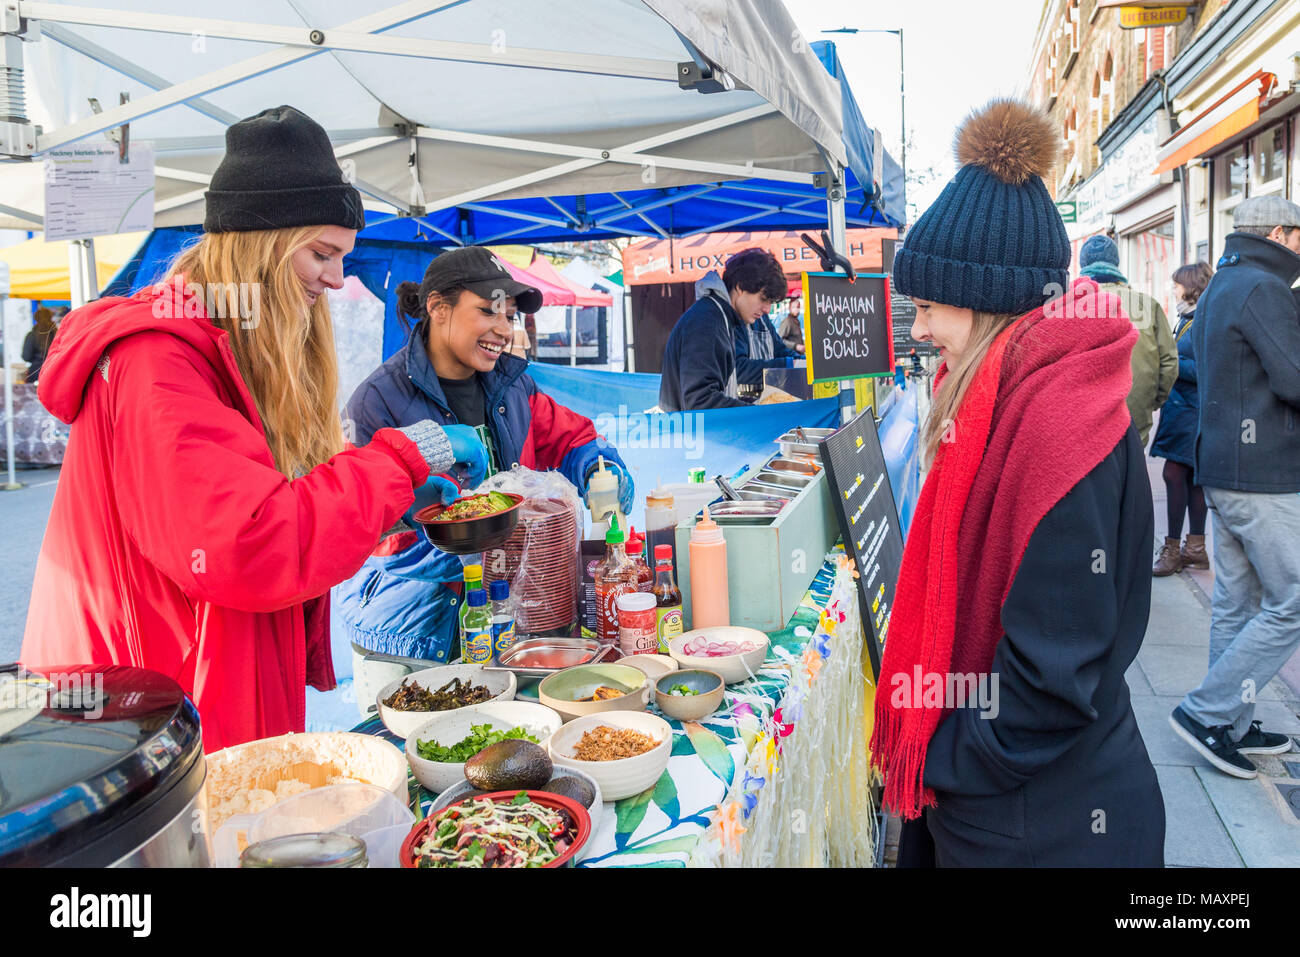 Street food stall at Chatsworth Road Market, Hackney, London, UK - Stock Image